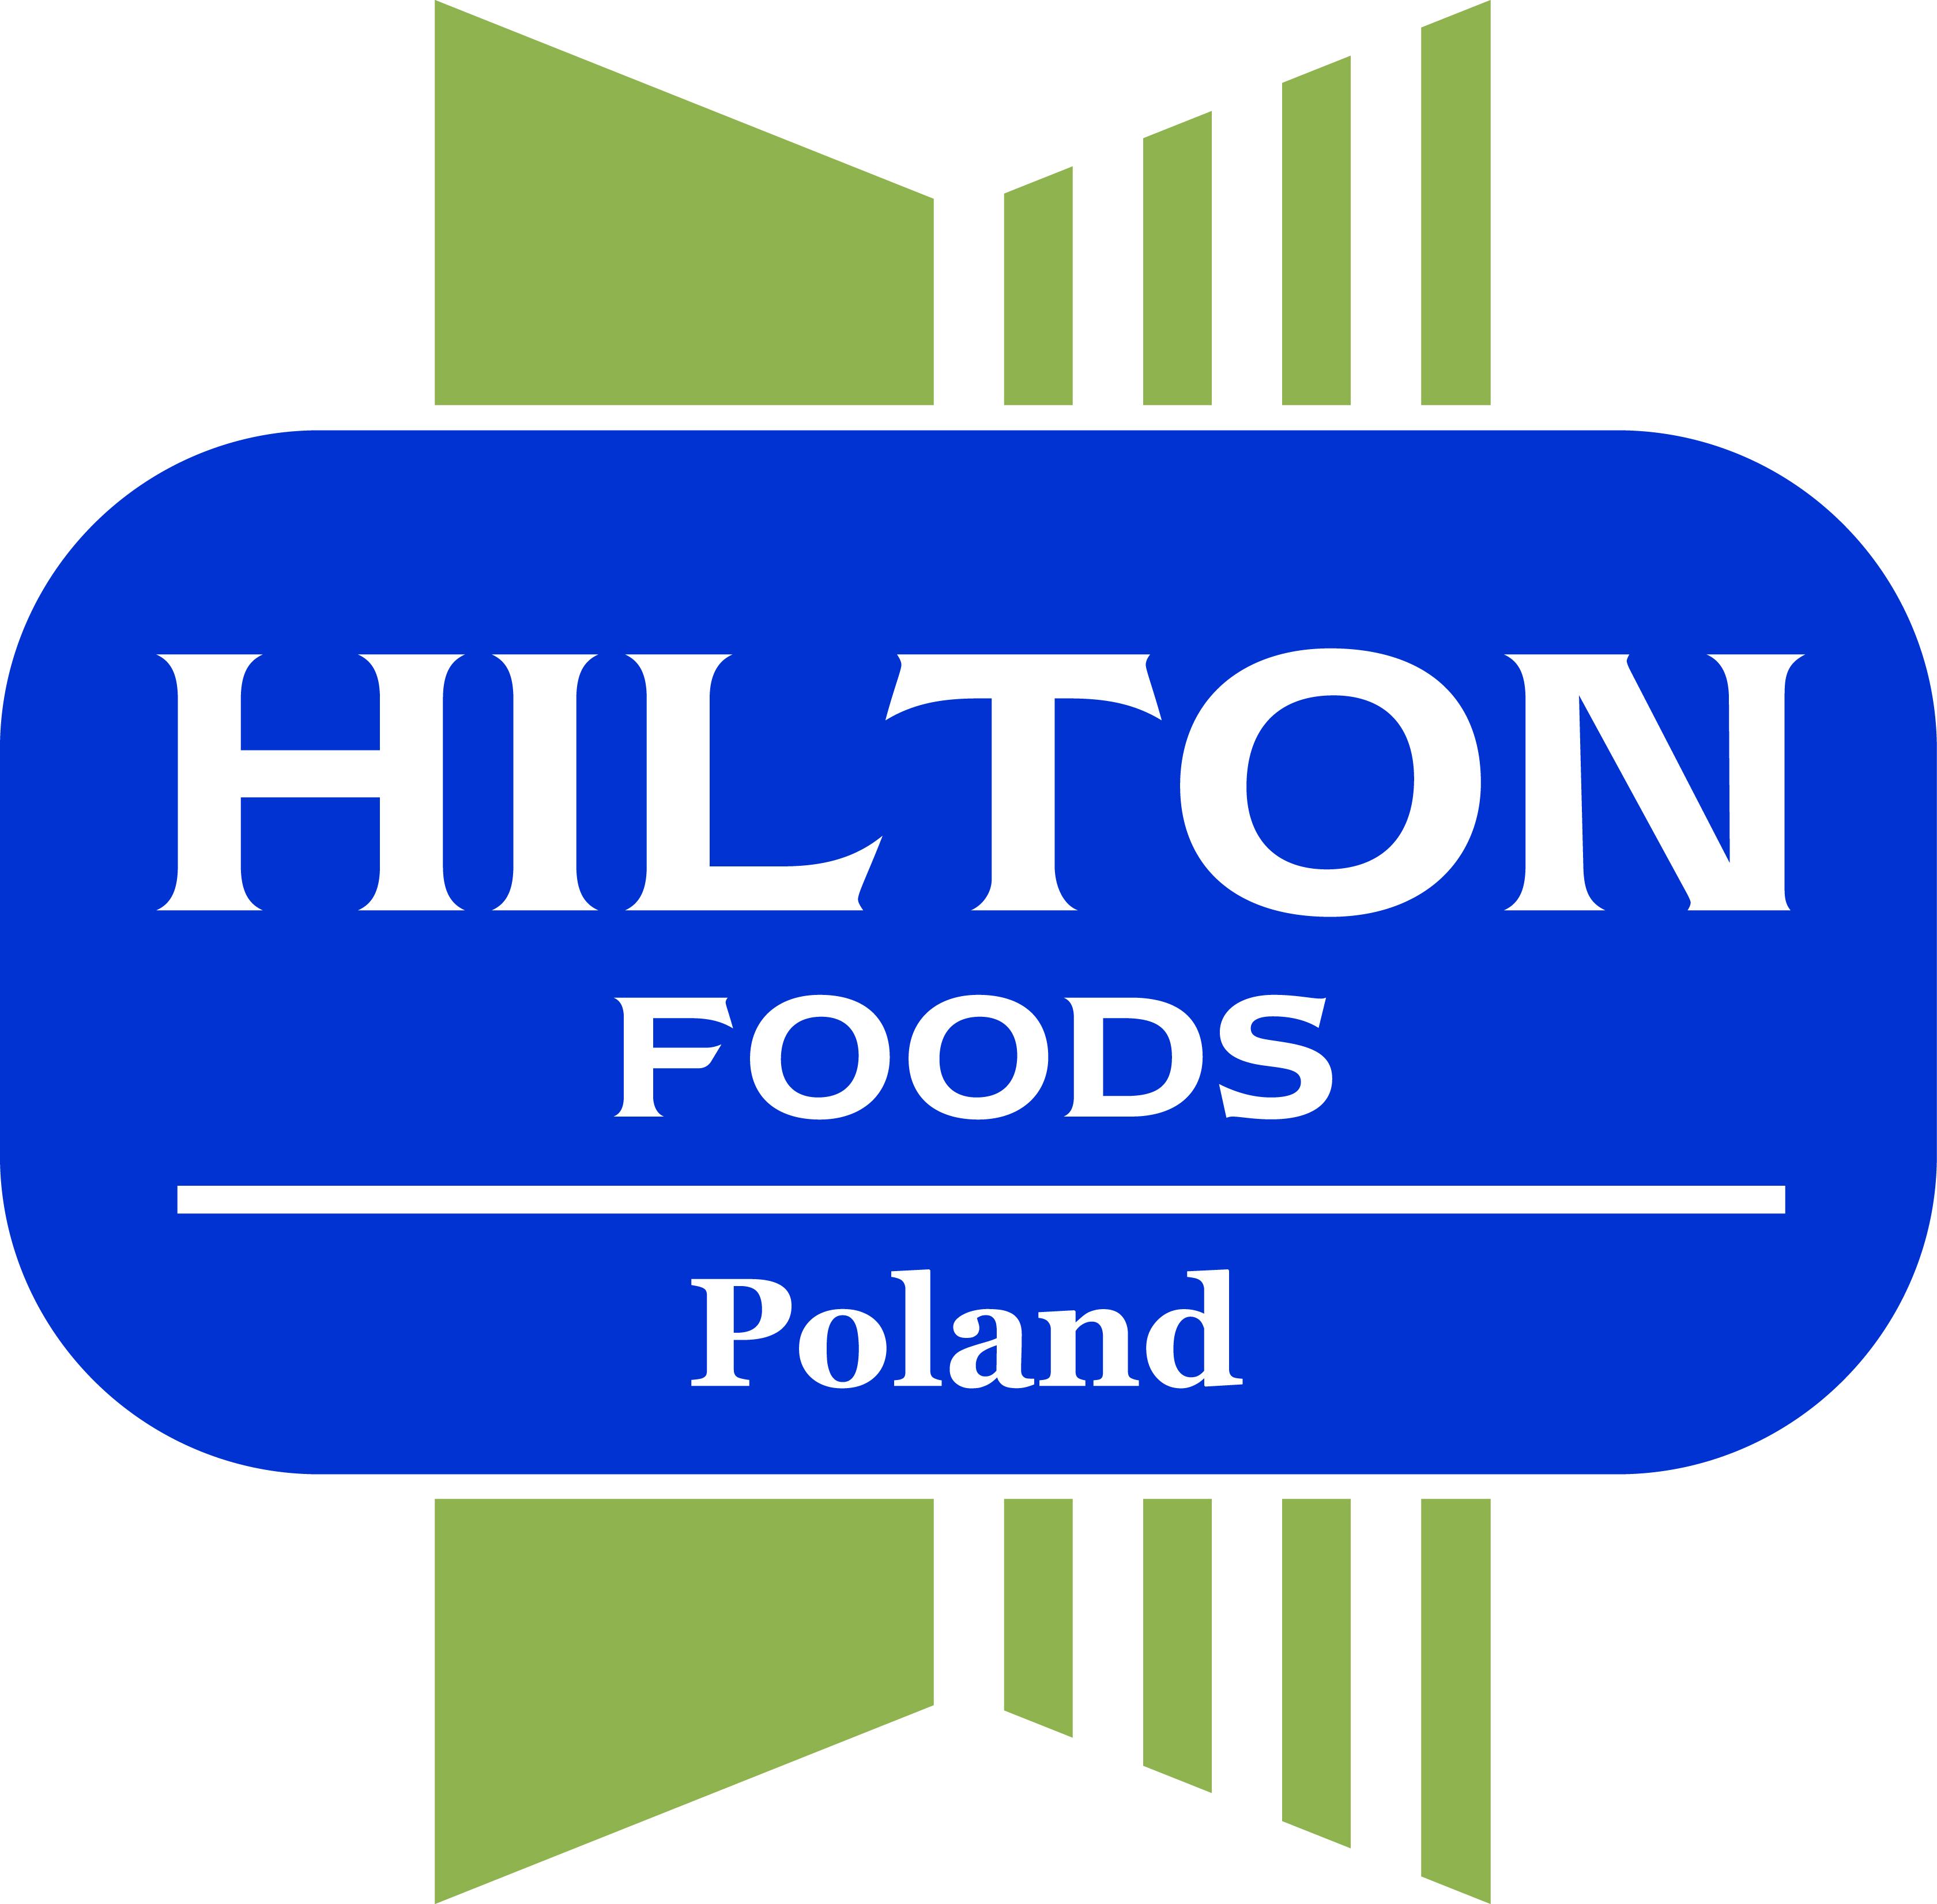 HFG_Poland